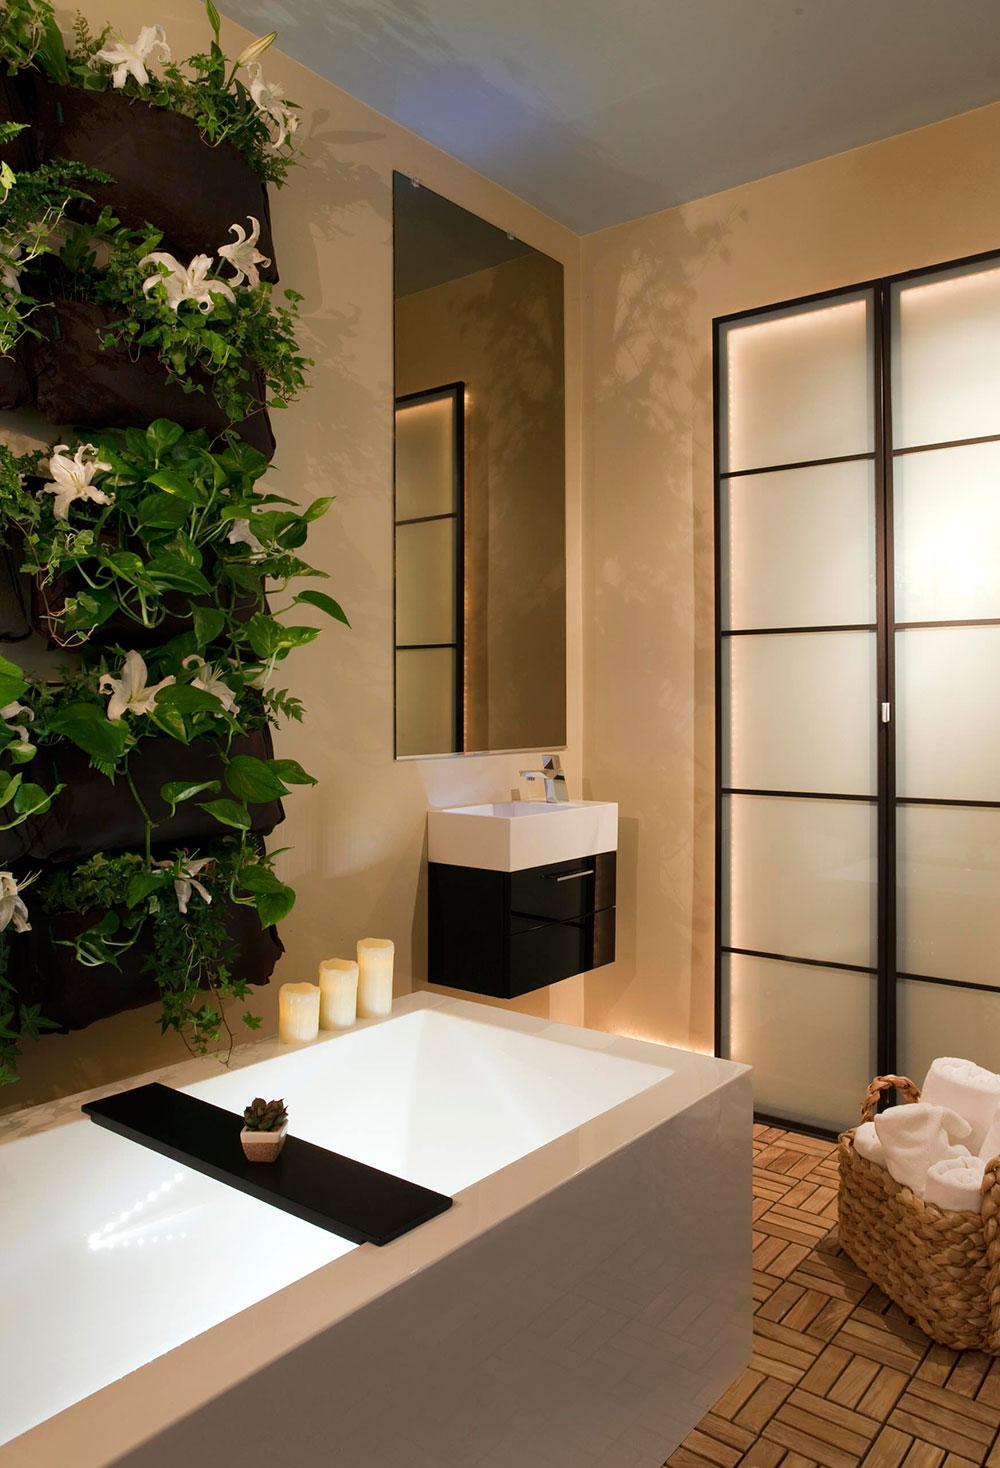 Tips-for-spa-bathroom-design-ideas Tips for a spa bathroom makeover